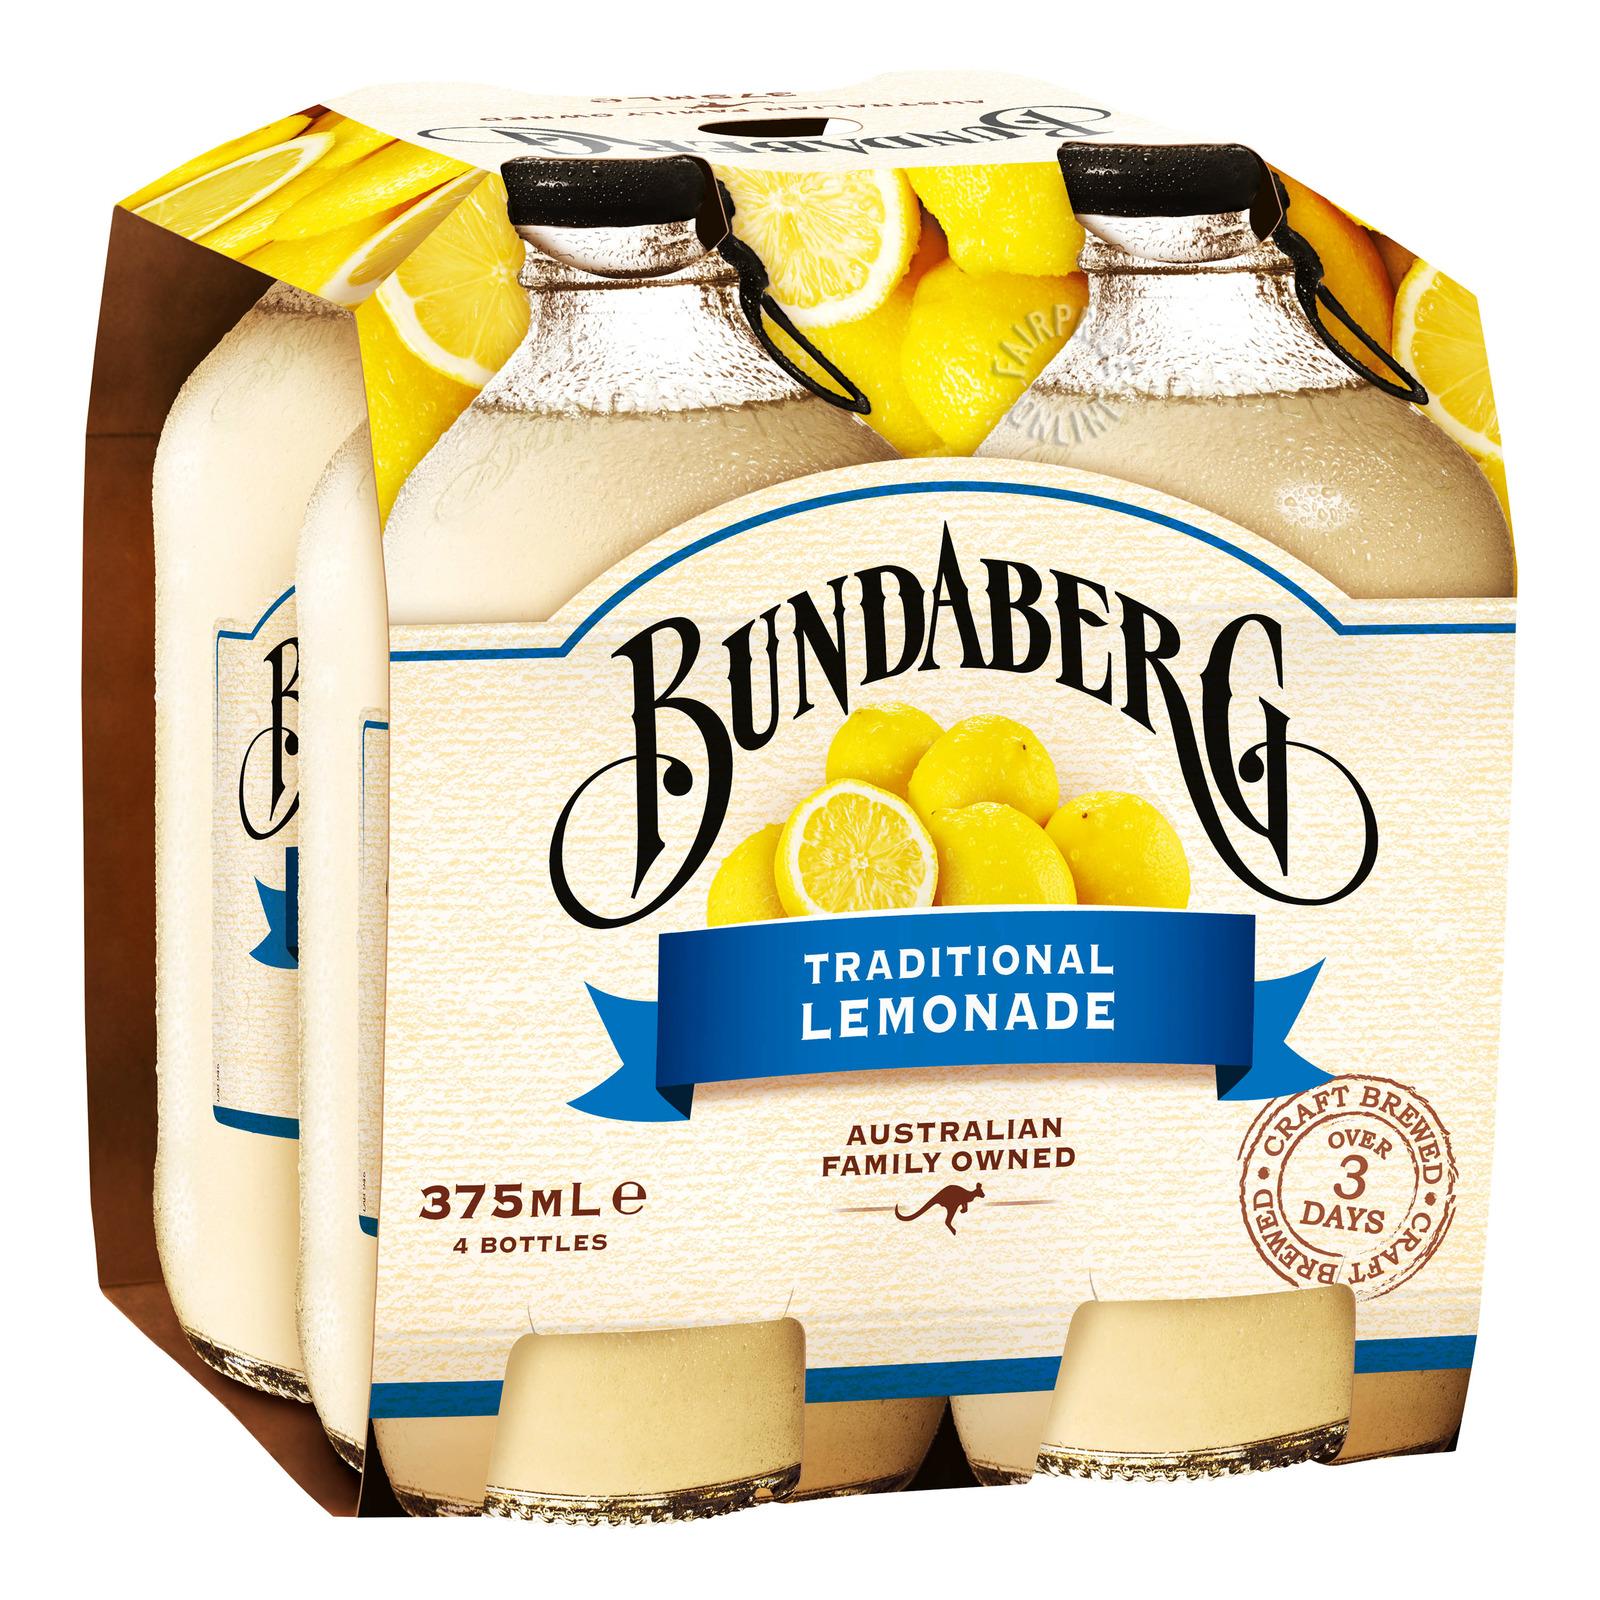 Bundaberg Bottle Drink - Traditional Lemonade